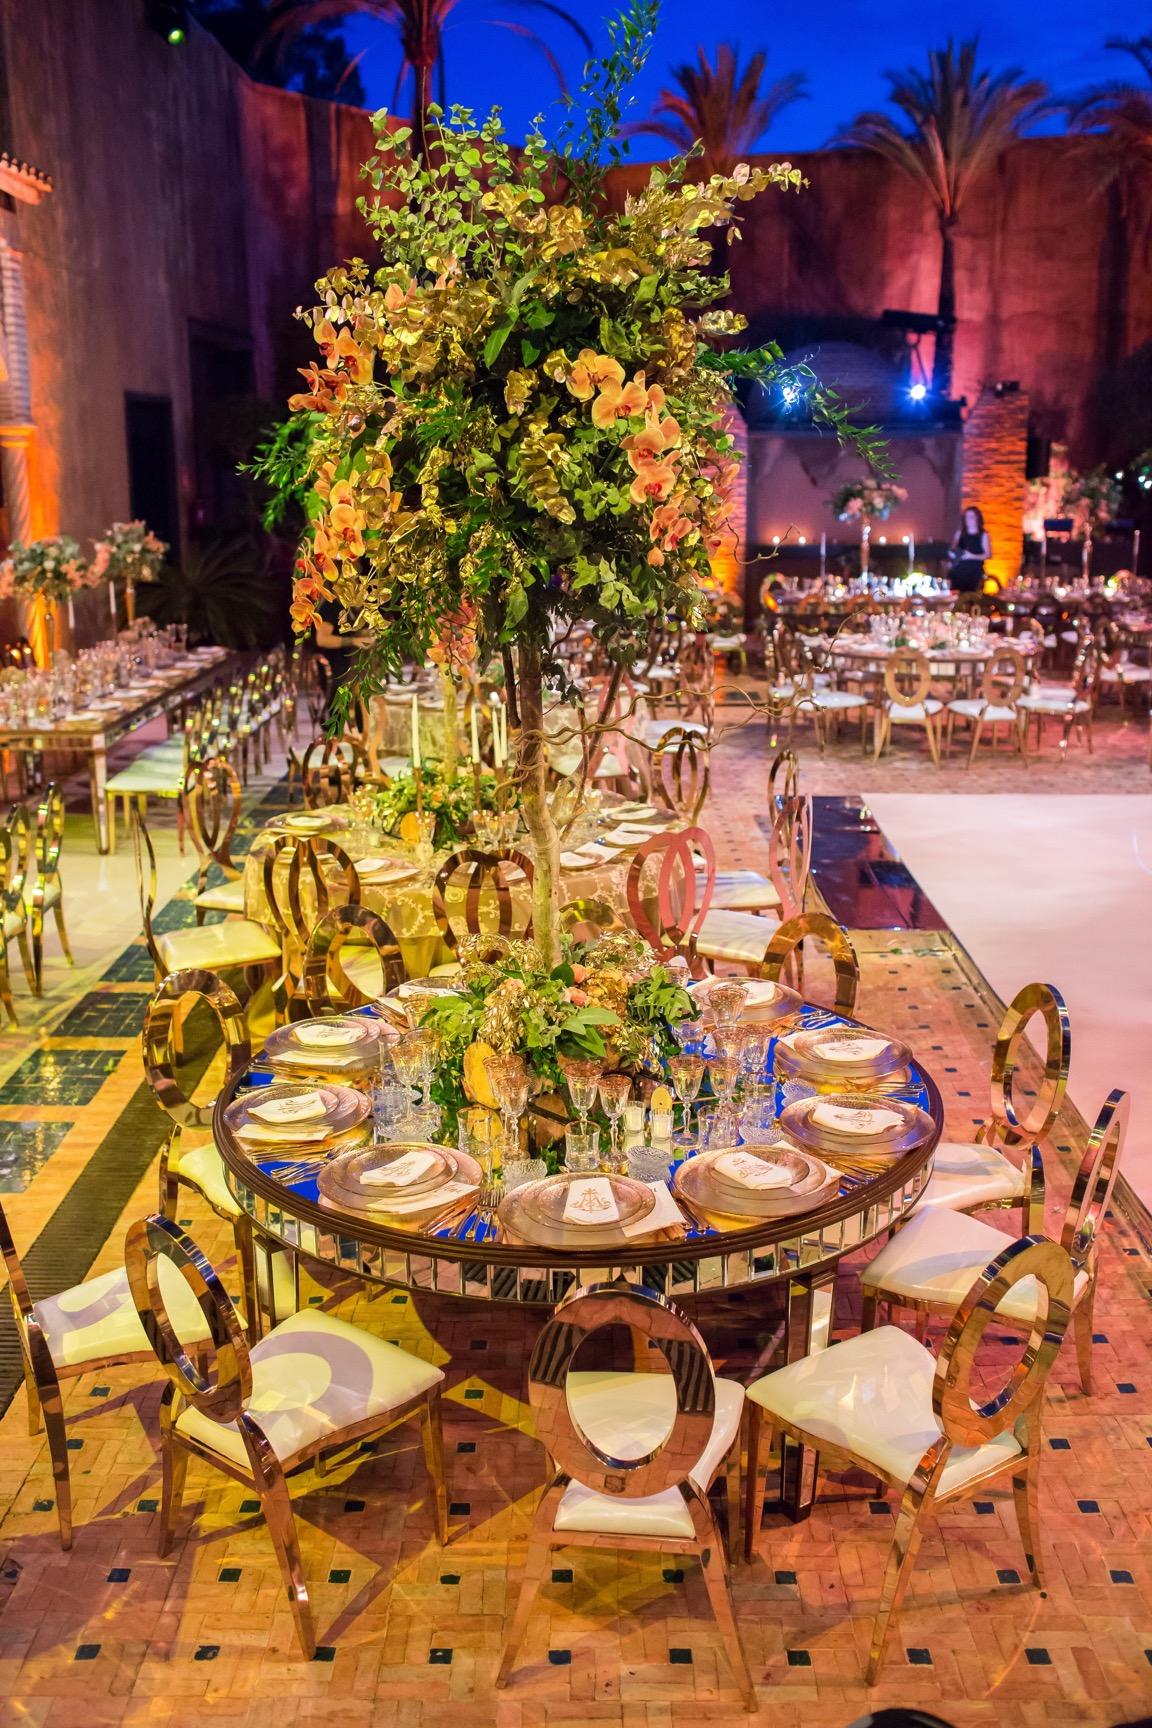 Si-Quiero-Wedding-Planner-By-Sira-Antequera-Bodas-Málaga-Marbella-Miami- L-A-35